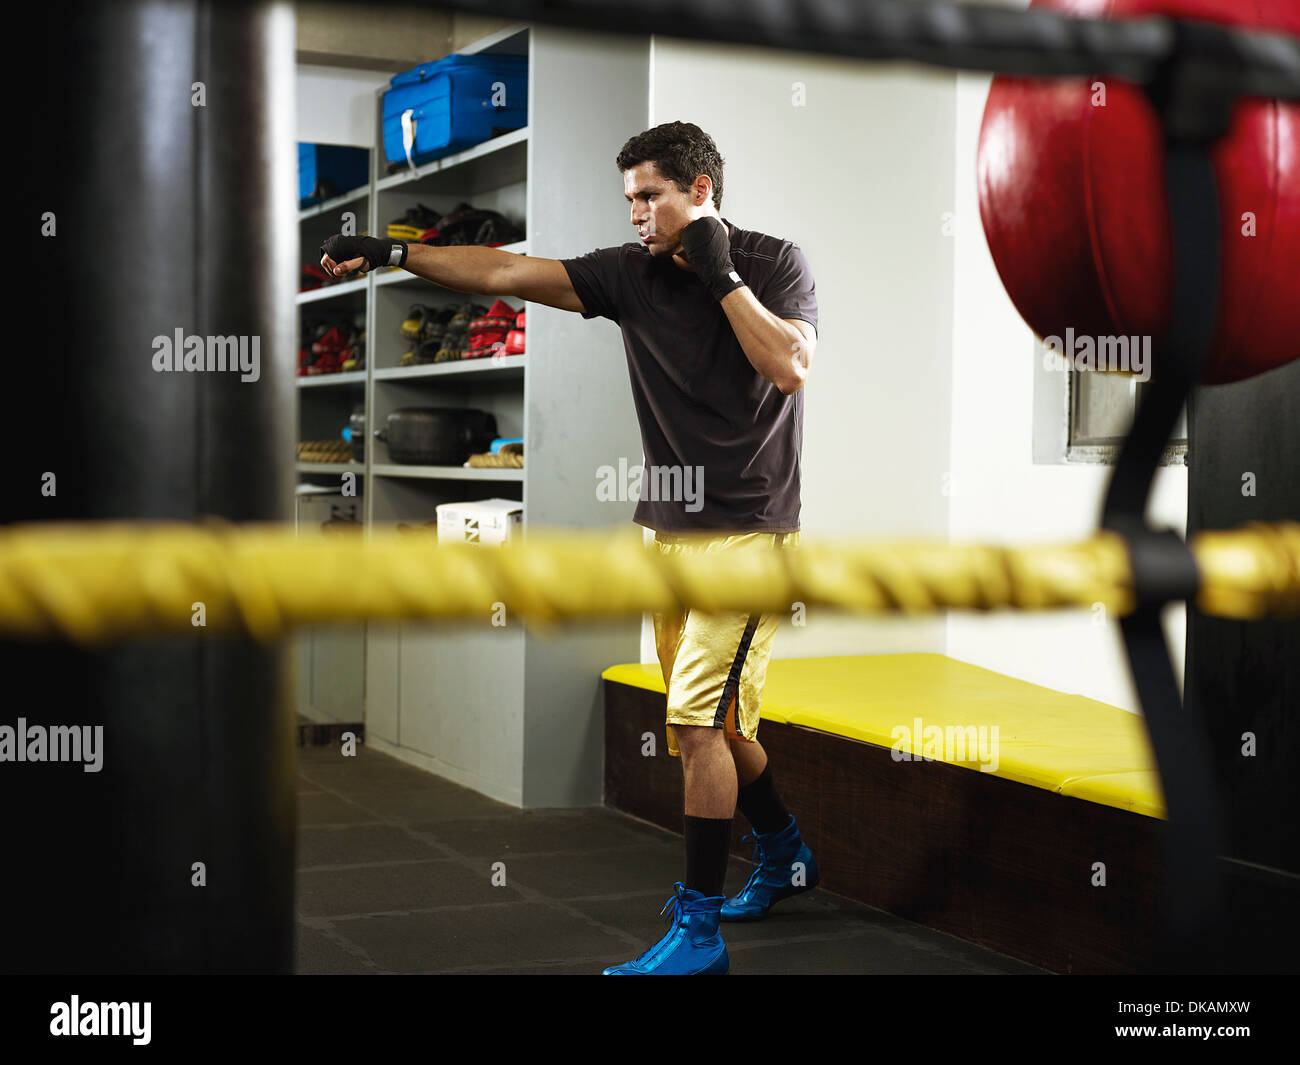 Boxer Aufwärmen im Umkleideraum Stockbild